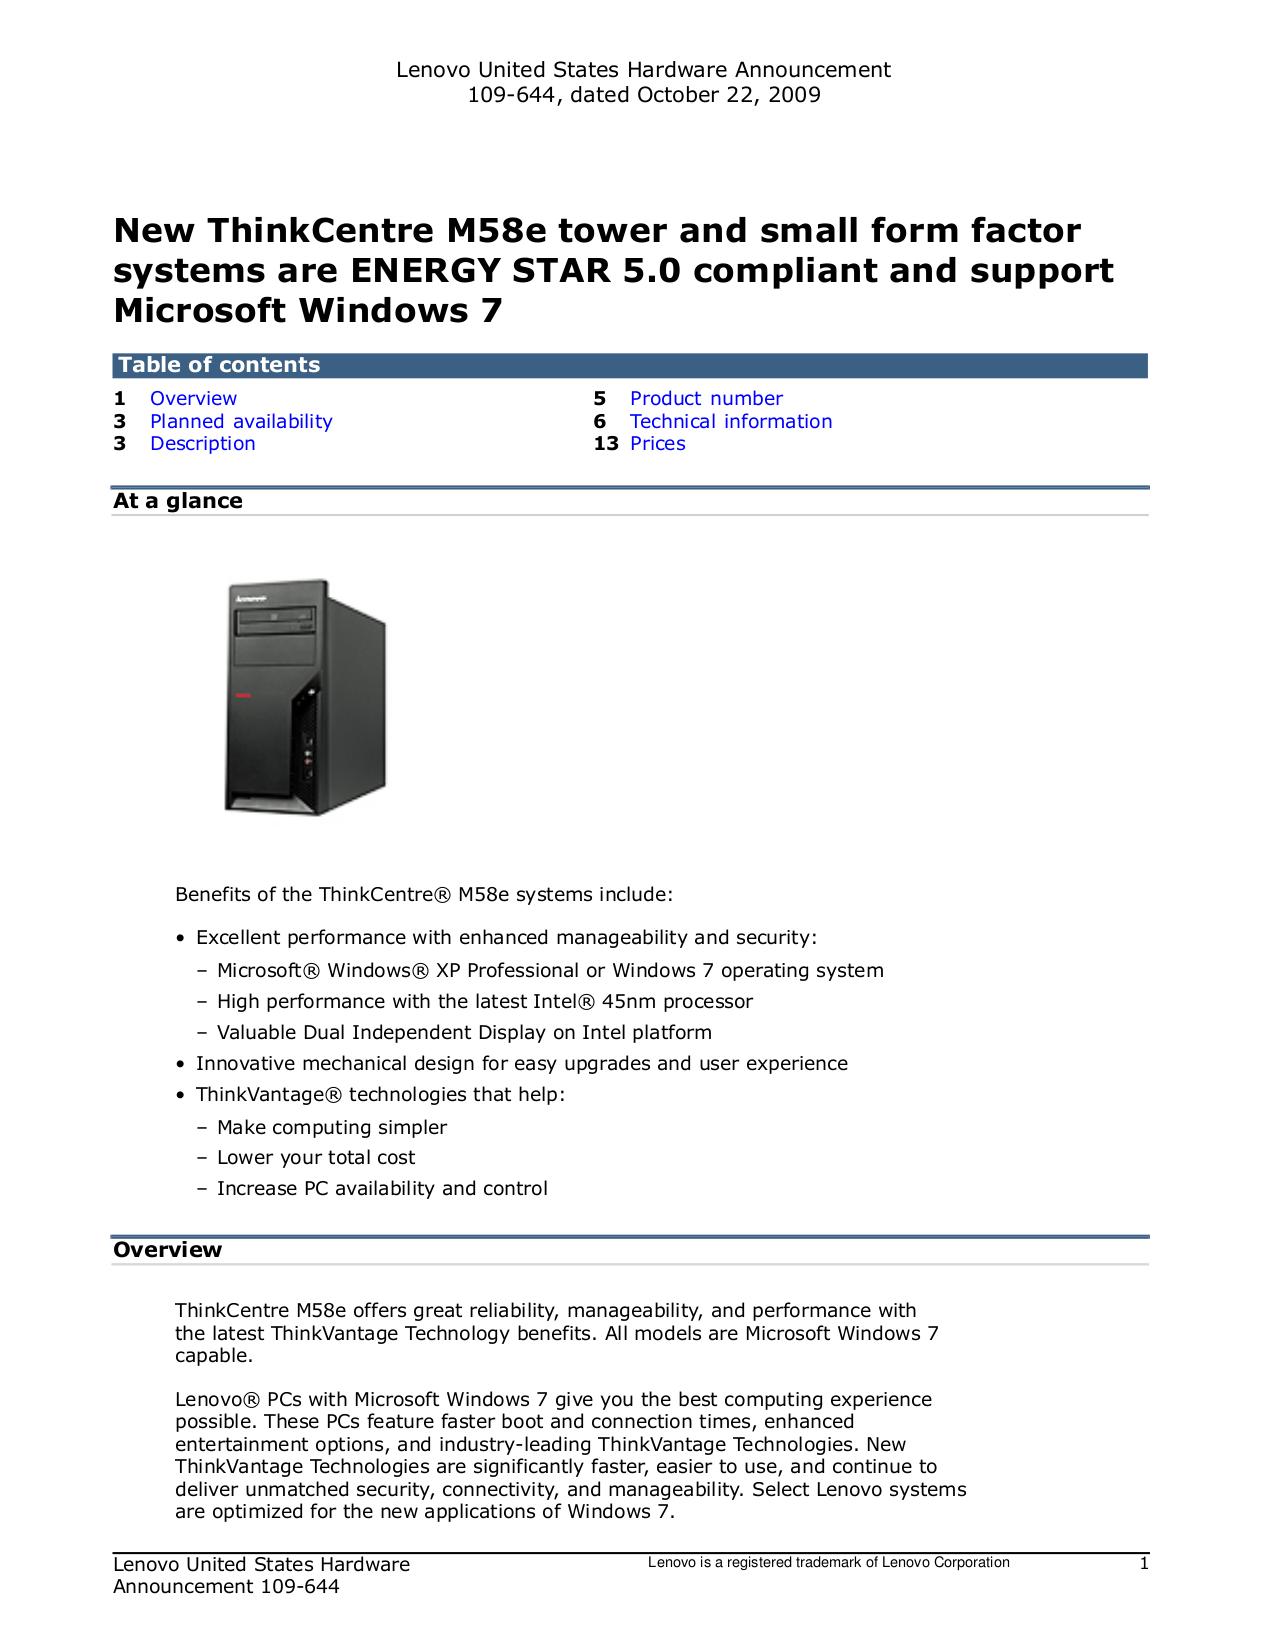 pdf for Lenovo Desktop ThinkCentre M58e 7506 manual